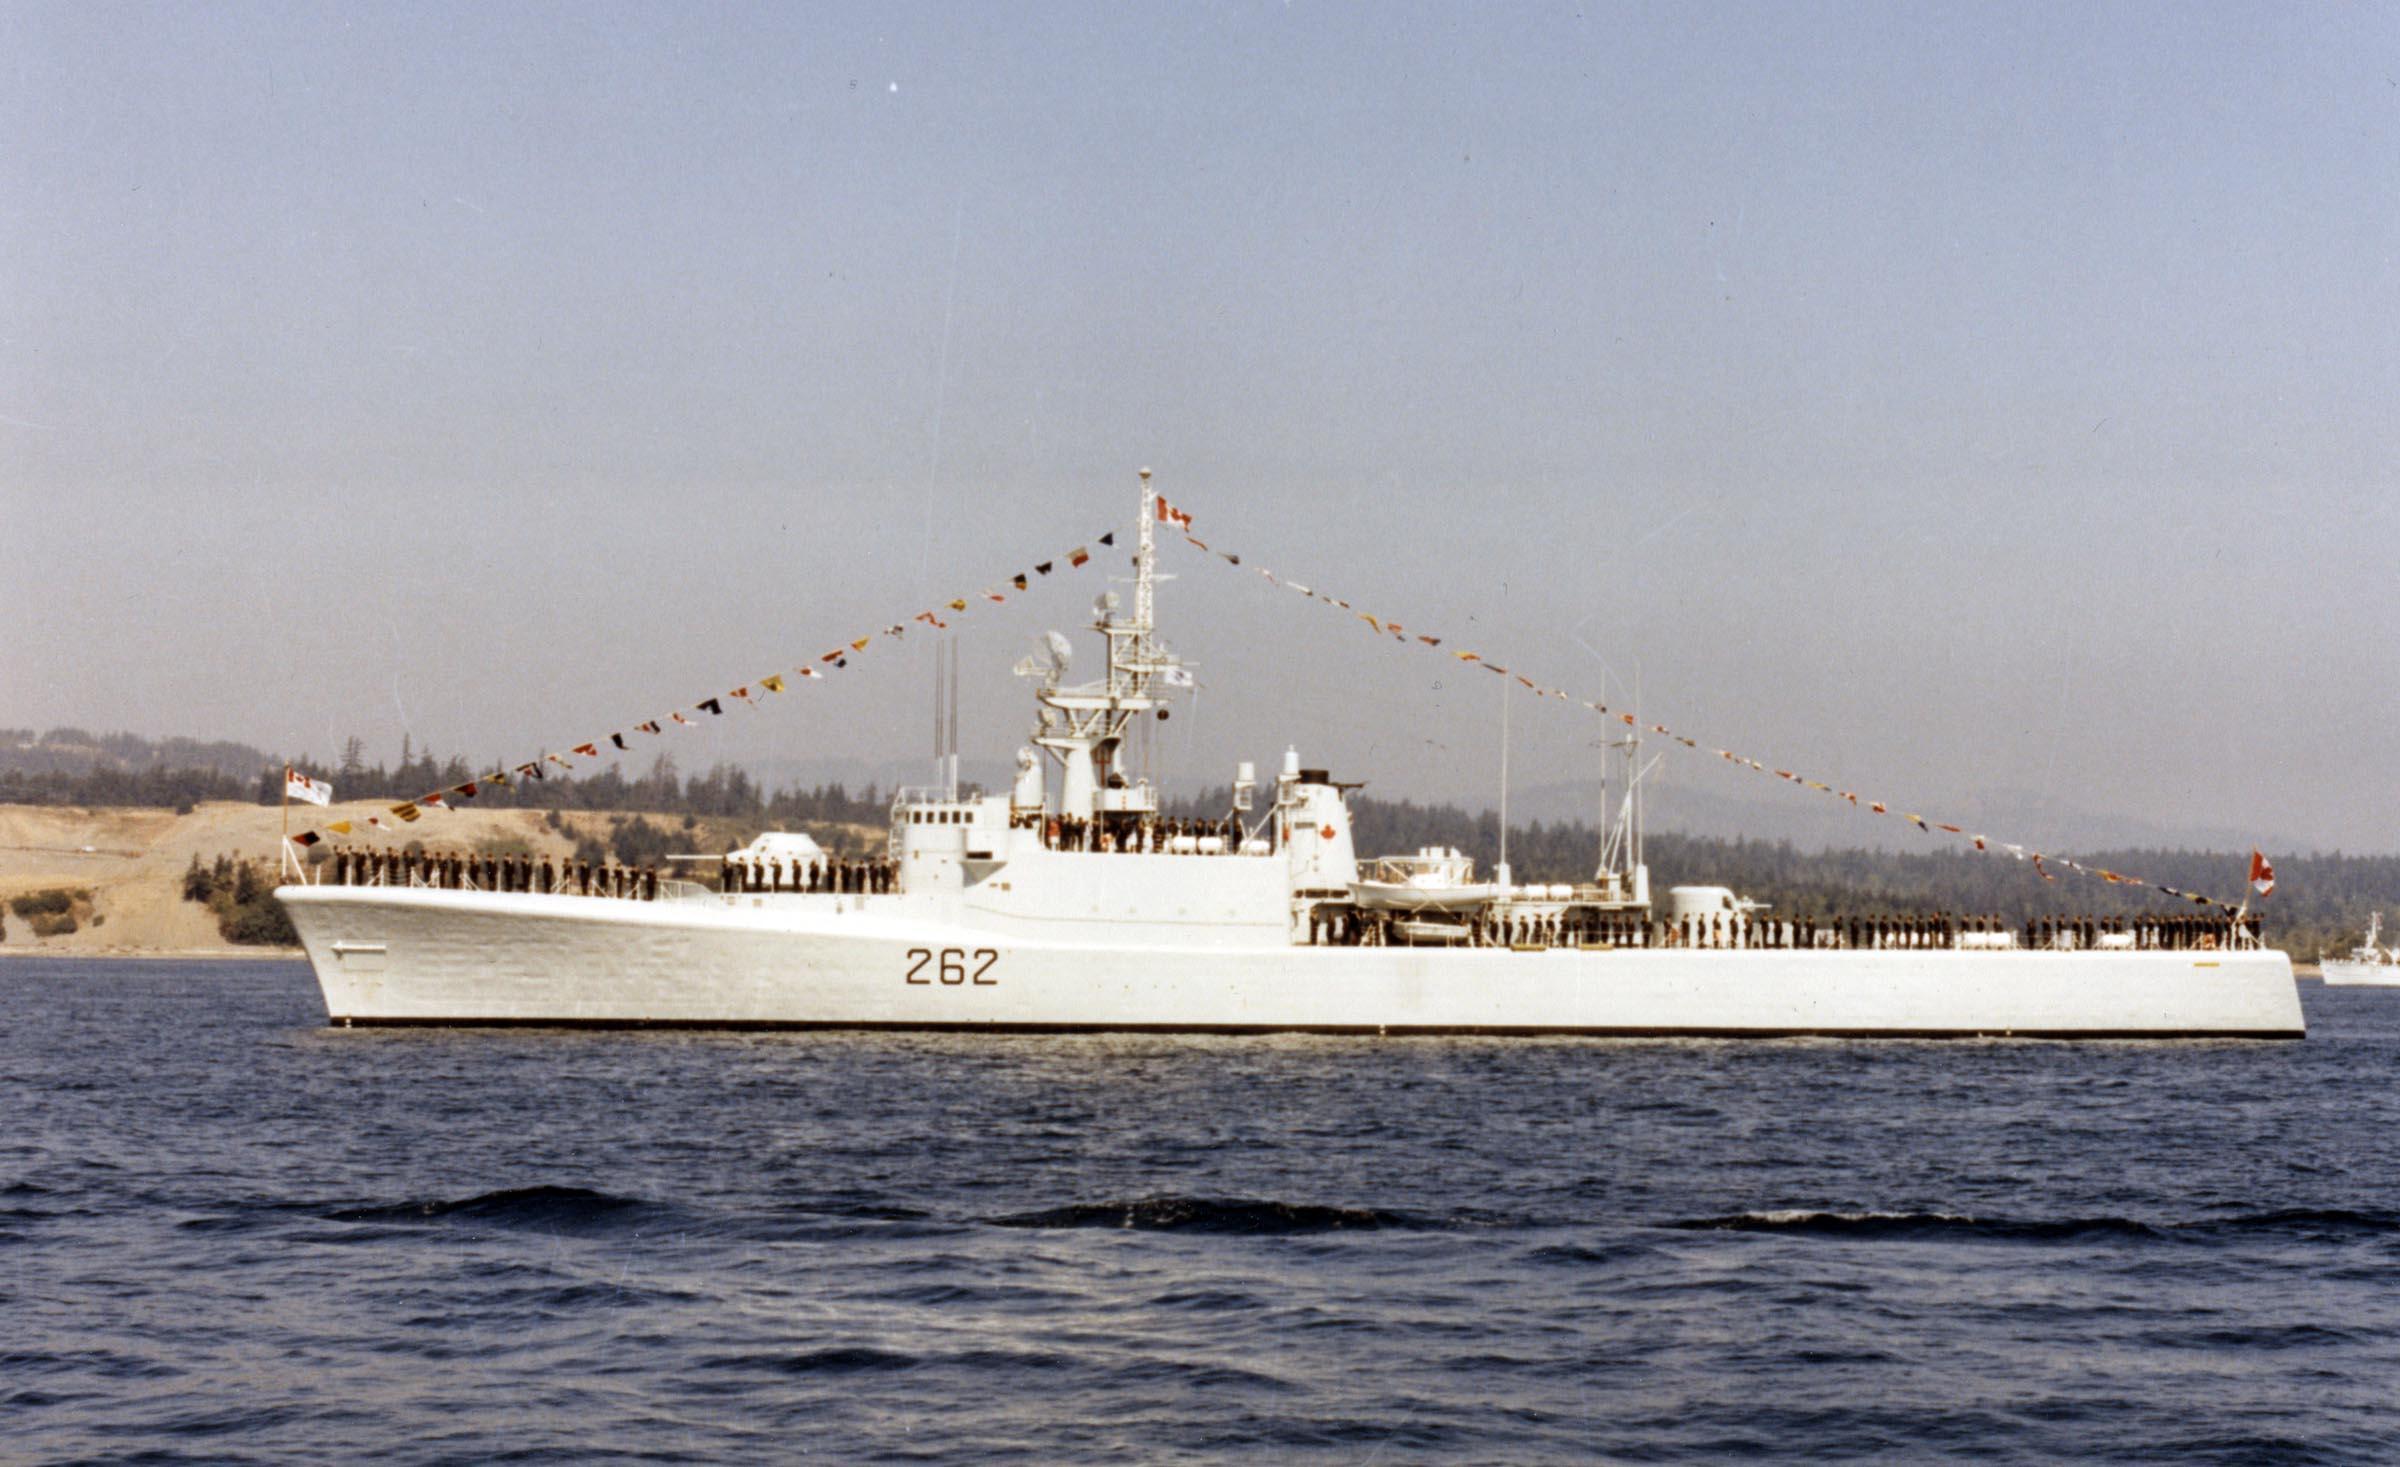 HMCS SASKATCHEWAN (2nd)